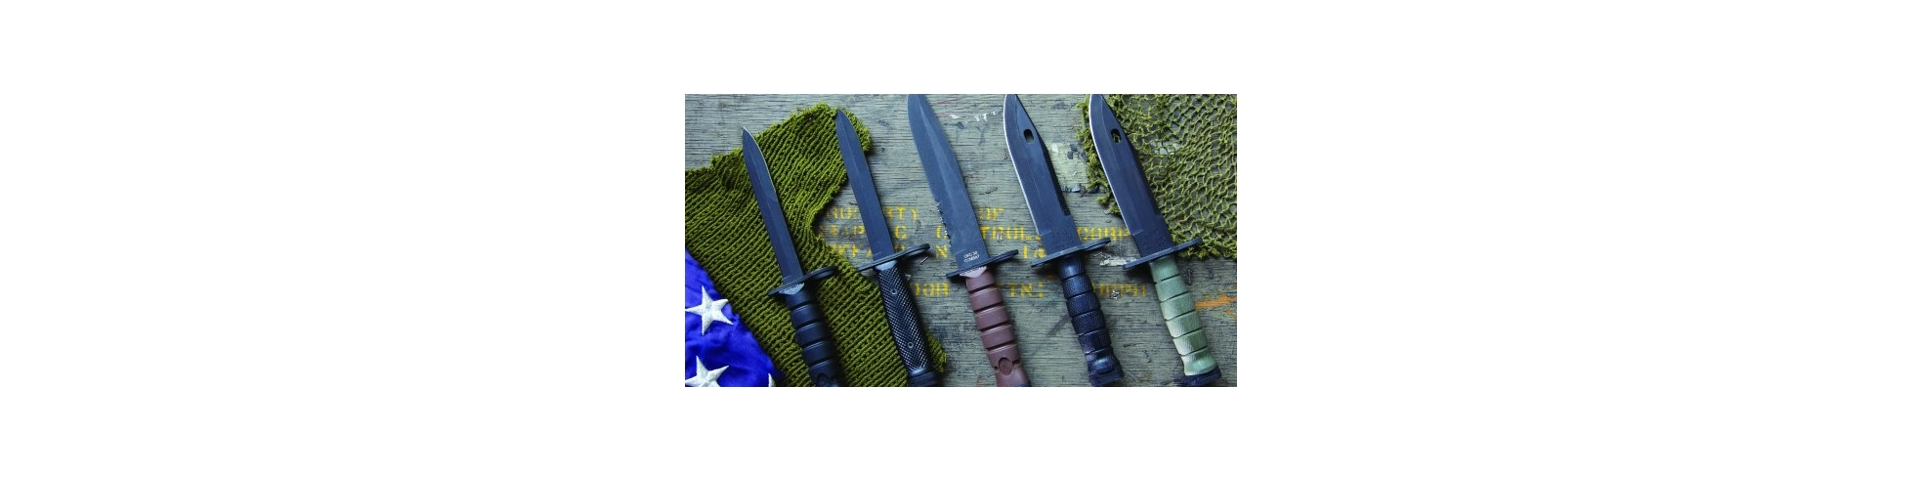 https://www.triple-r-products.com/catalog/ontario-knife-company-bayonets/ontario-knife-company-bayonets